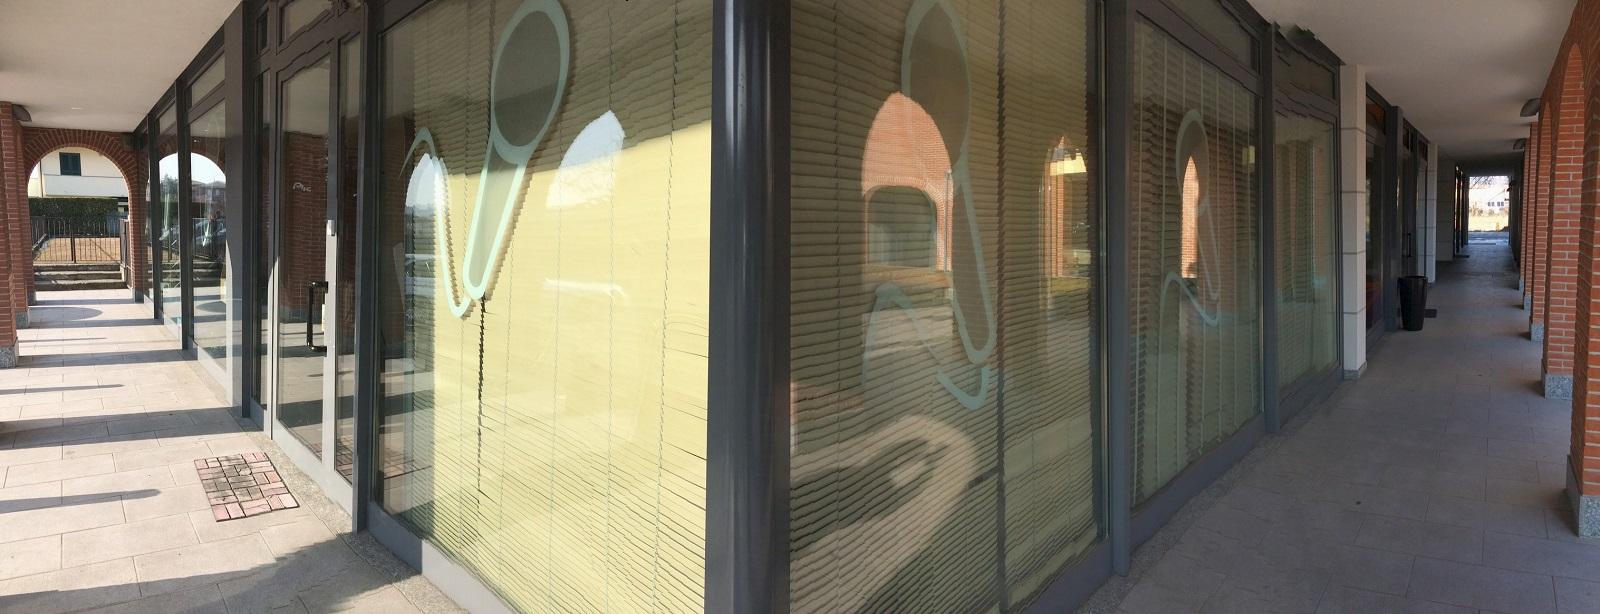 vetrine negozio.jpg